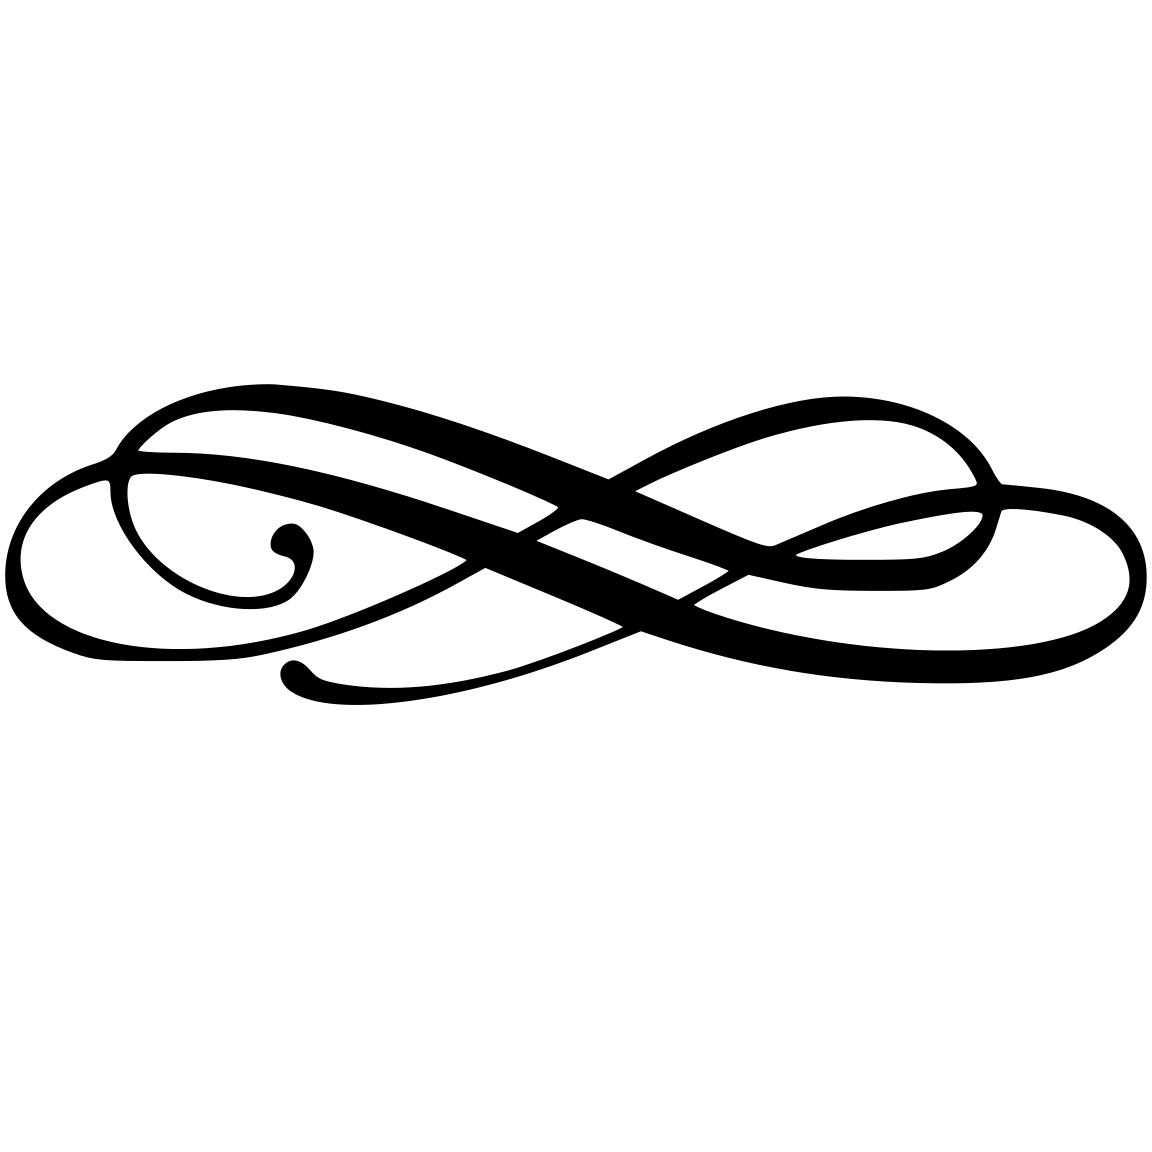 1152x1152 Similiar Simple Flourish Clip Art Keywords 2